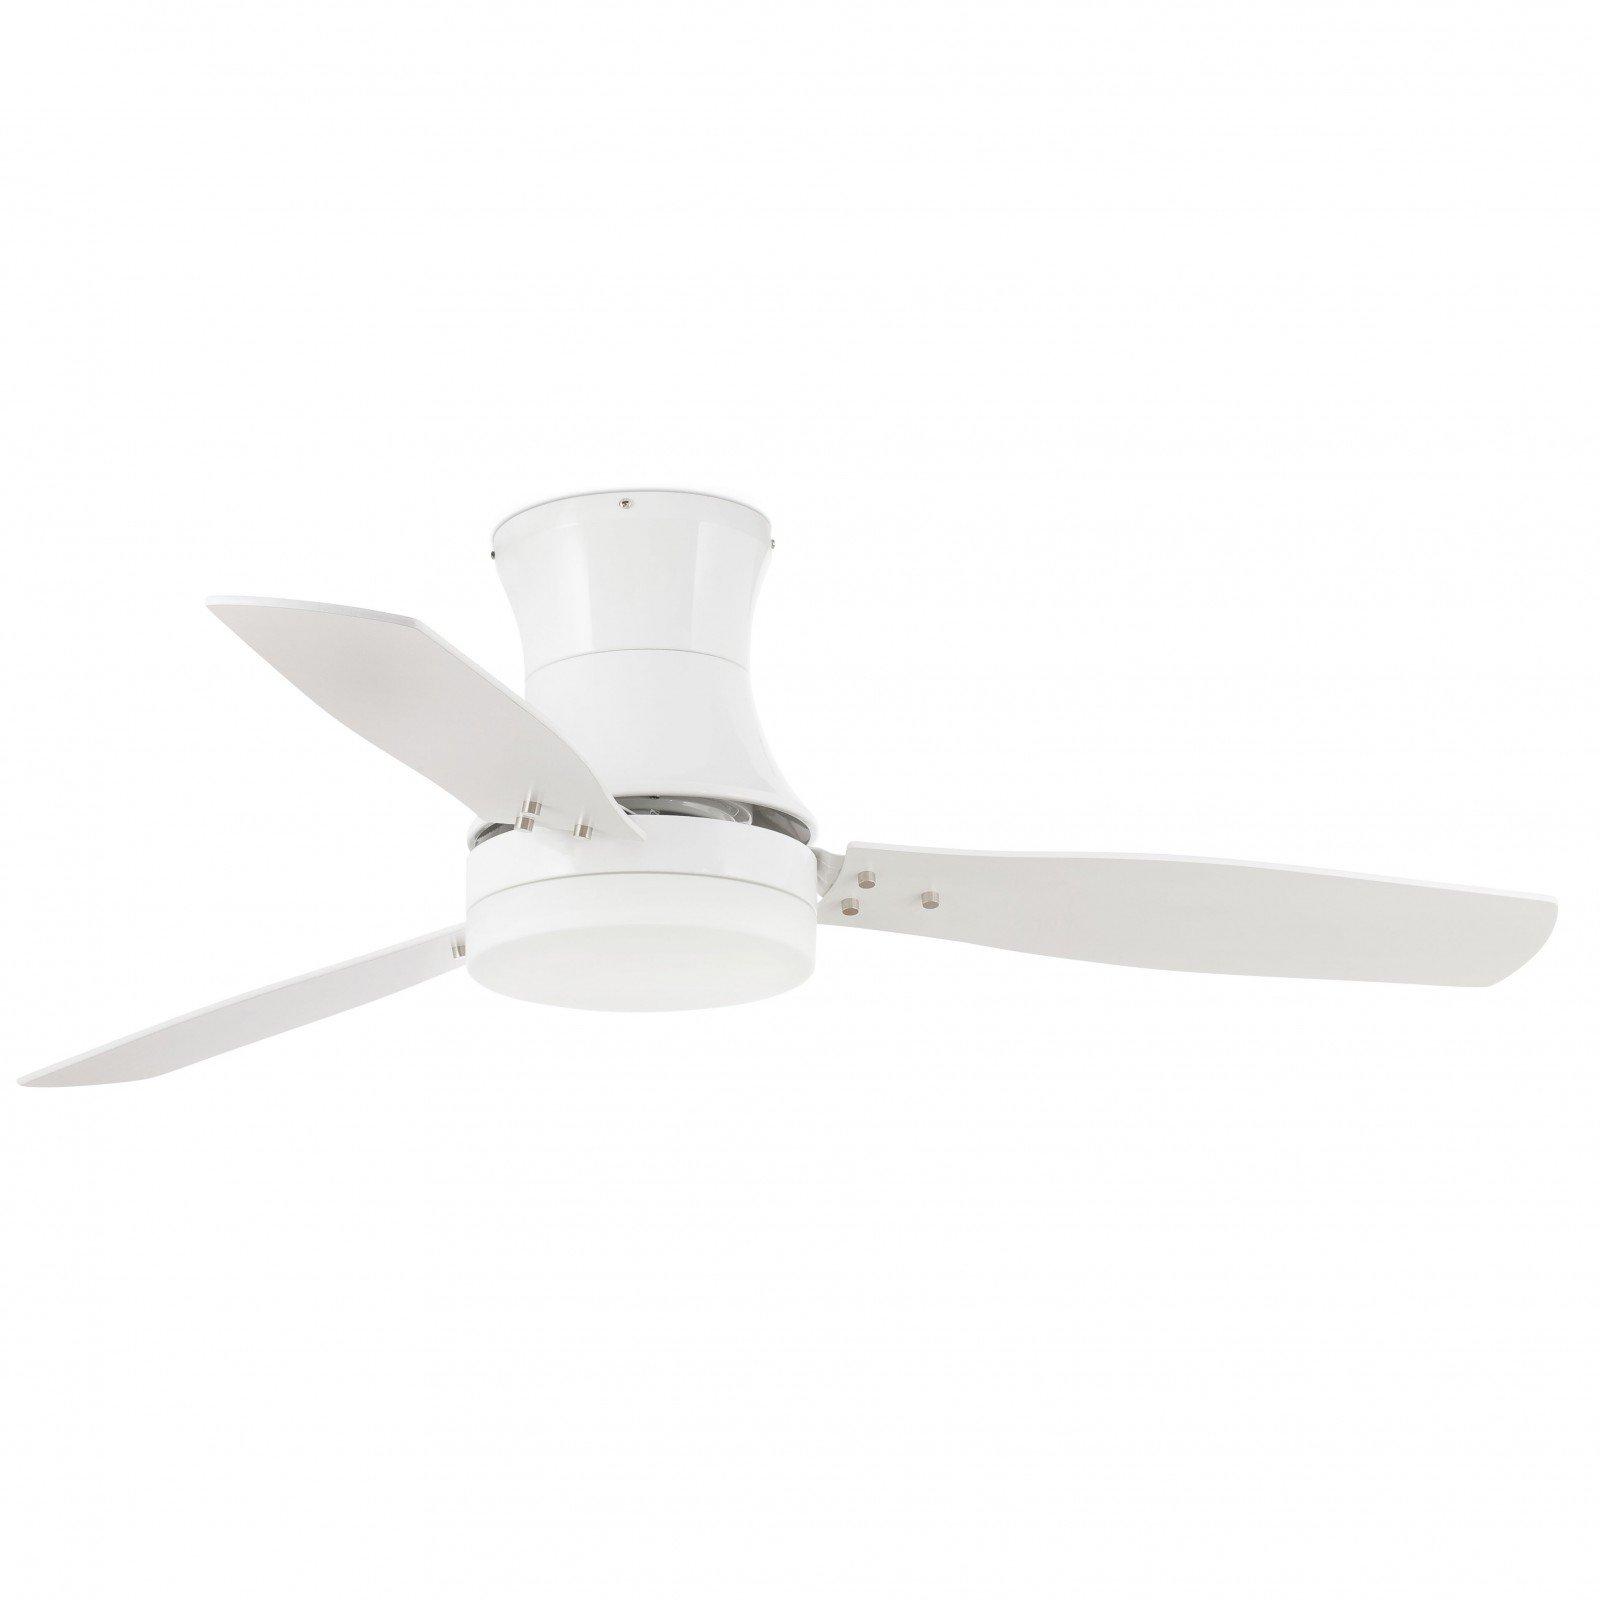 Faro 33384 TONSAY Ventilateur de plafond blanc product image